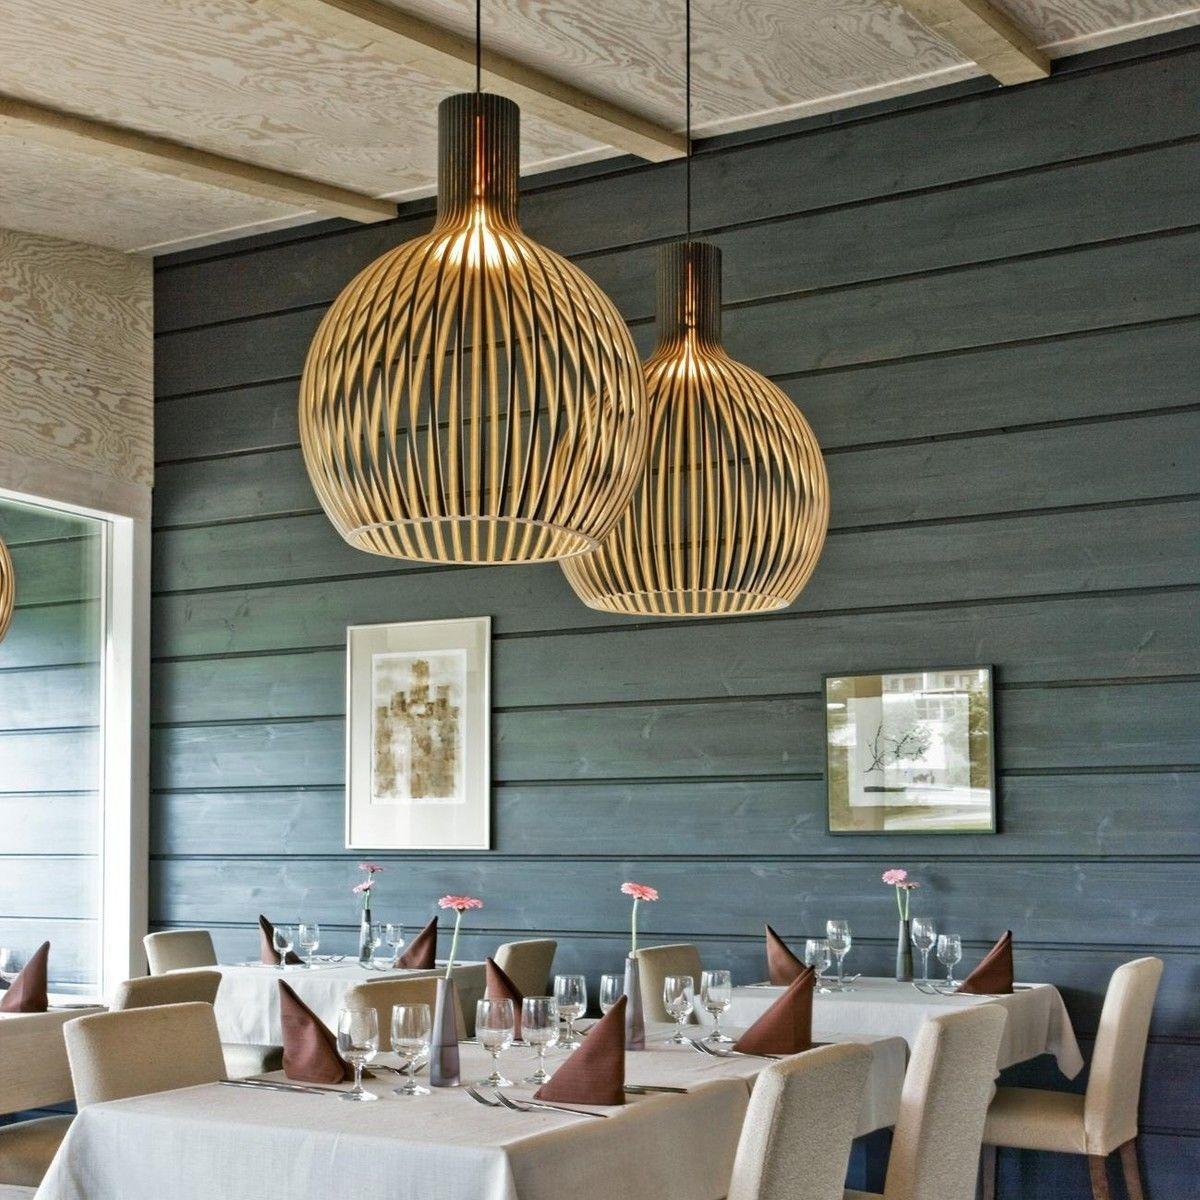 octo 4240 suspension lamp secto design. Black Bedroom Furniture Sets. Home Design Ideas